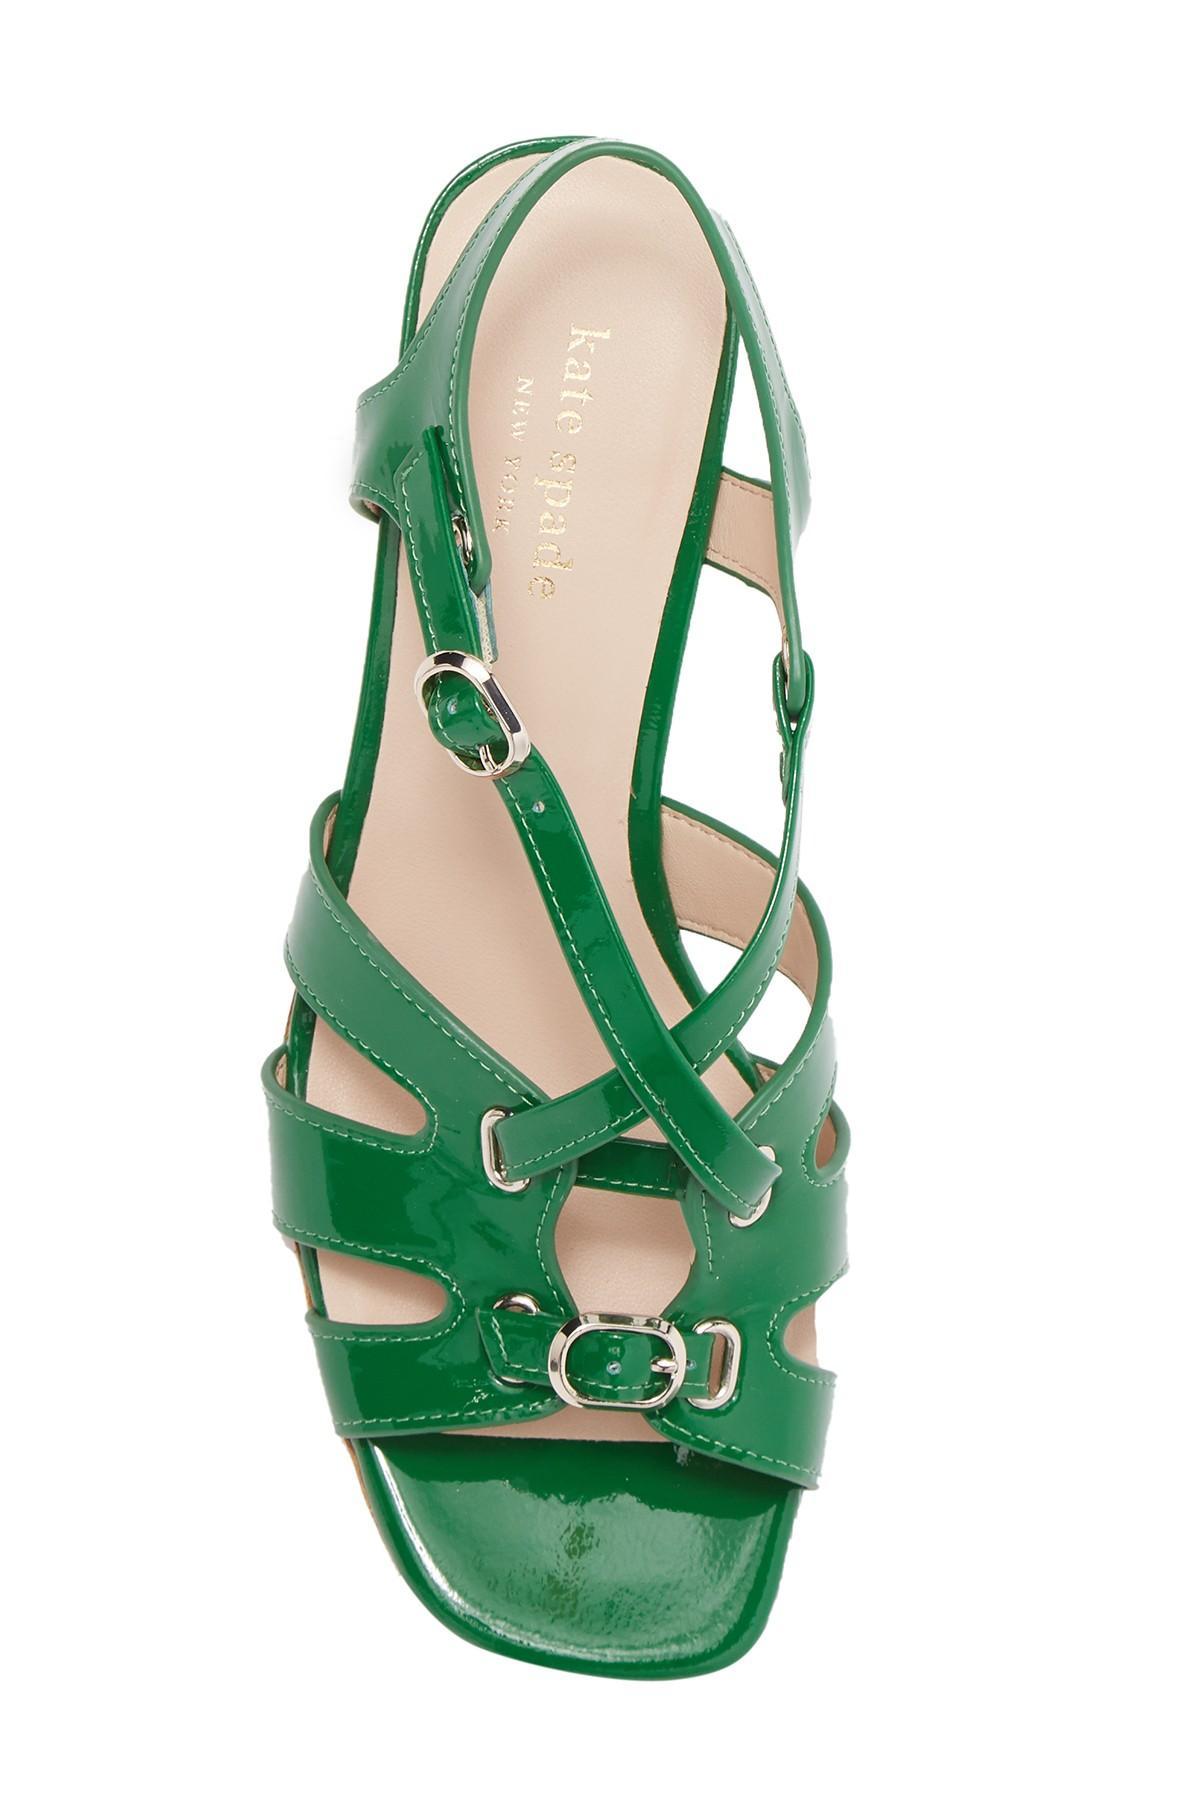 Kate Spade Denim Ella Sandals in Green